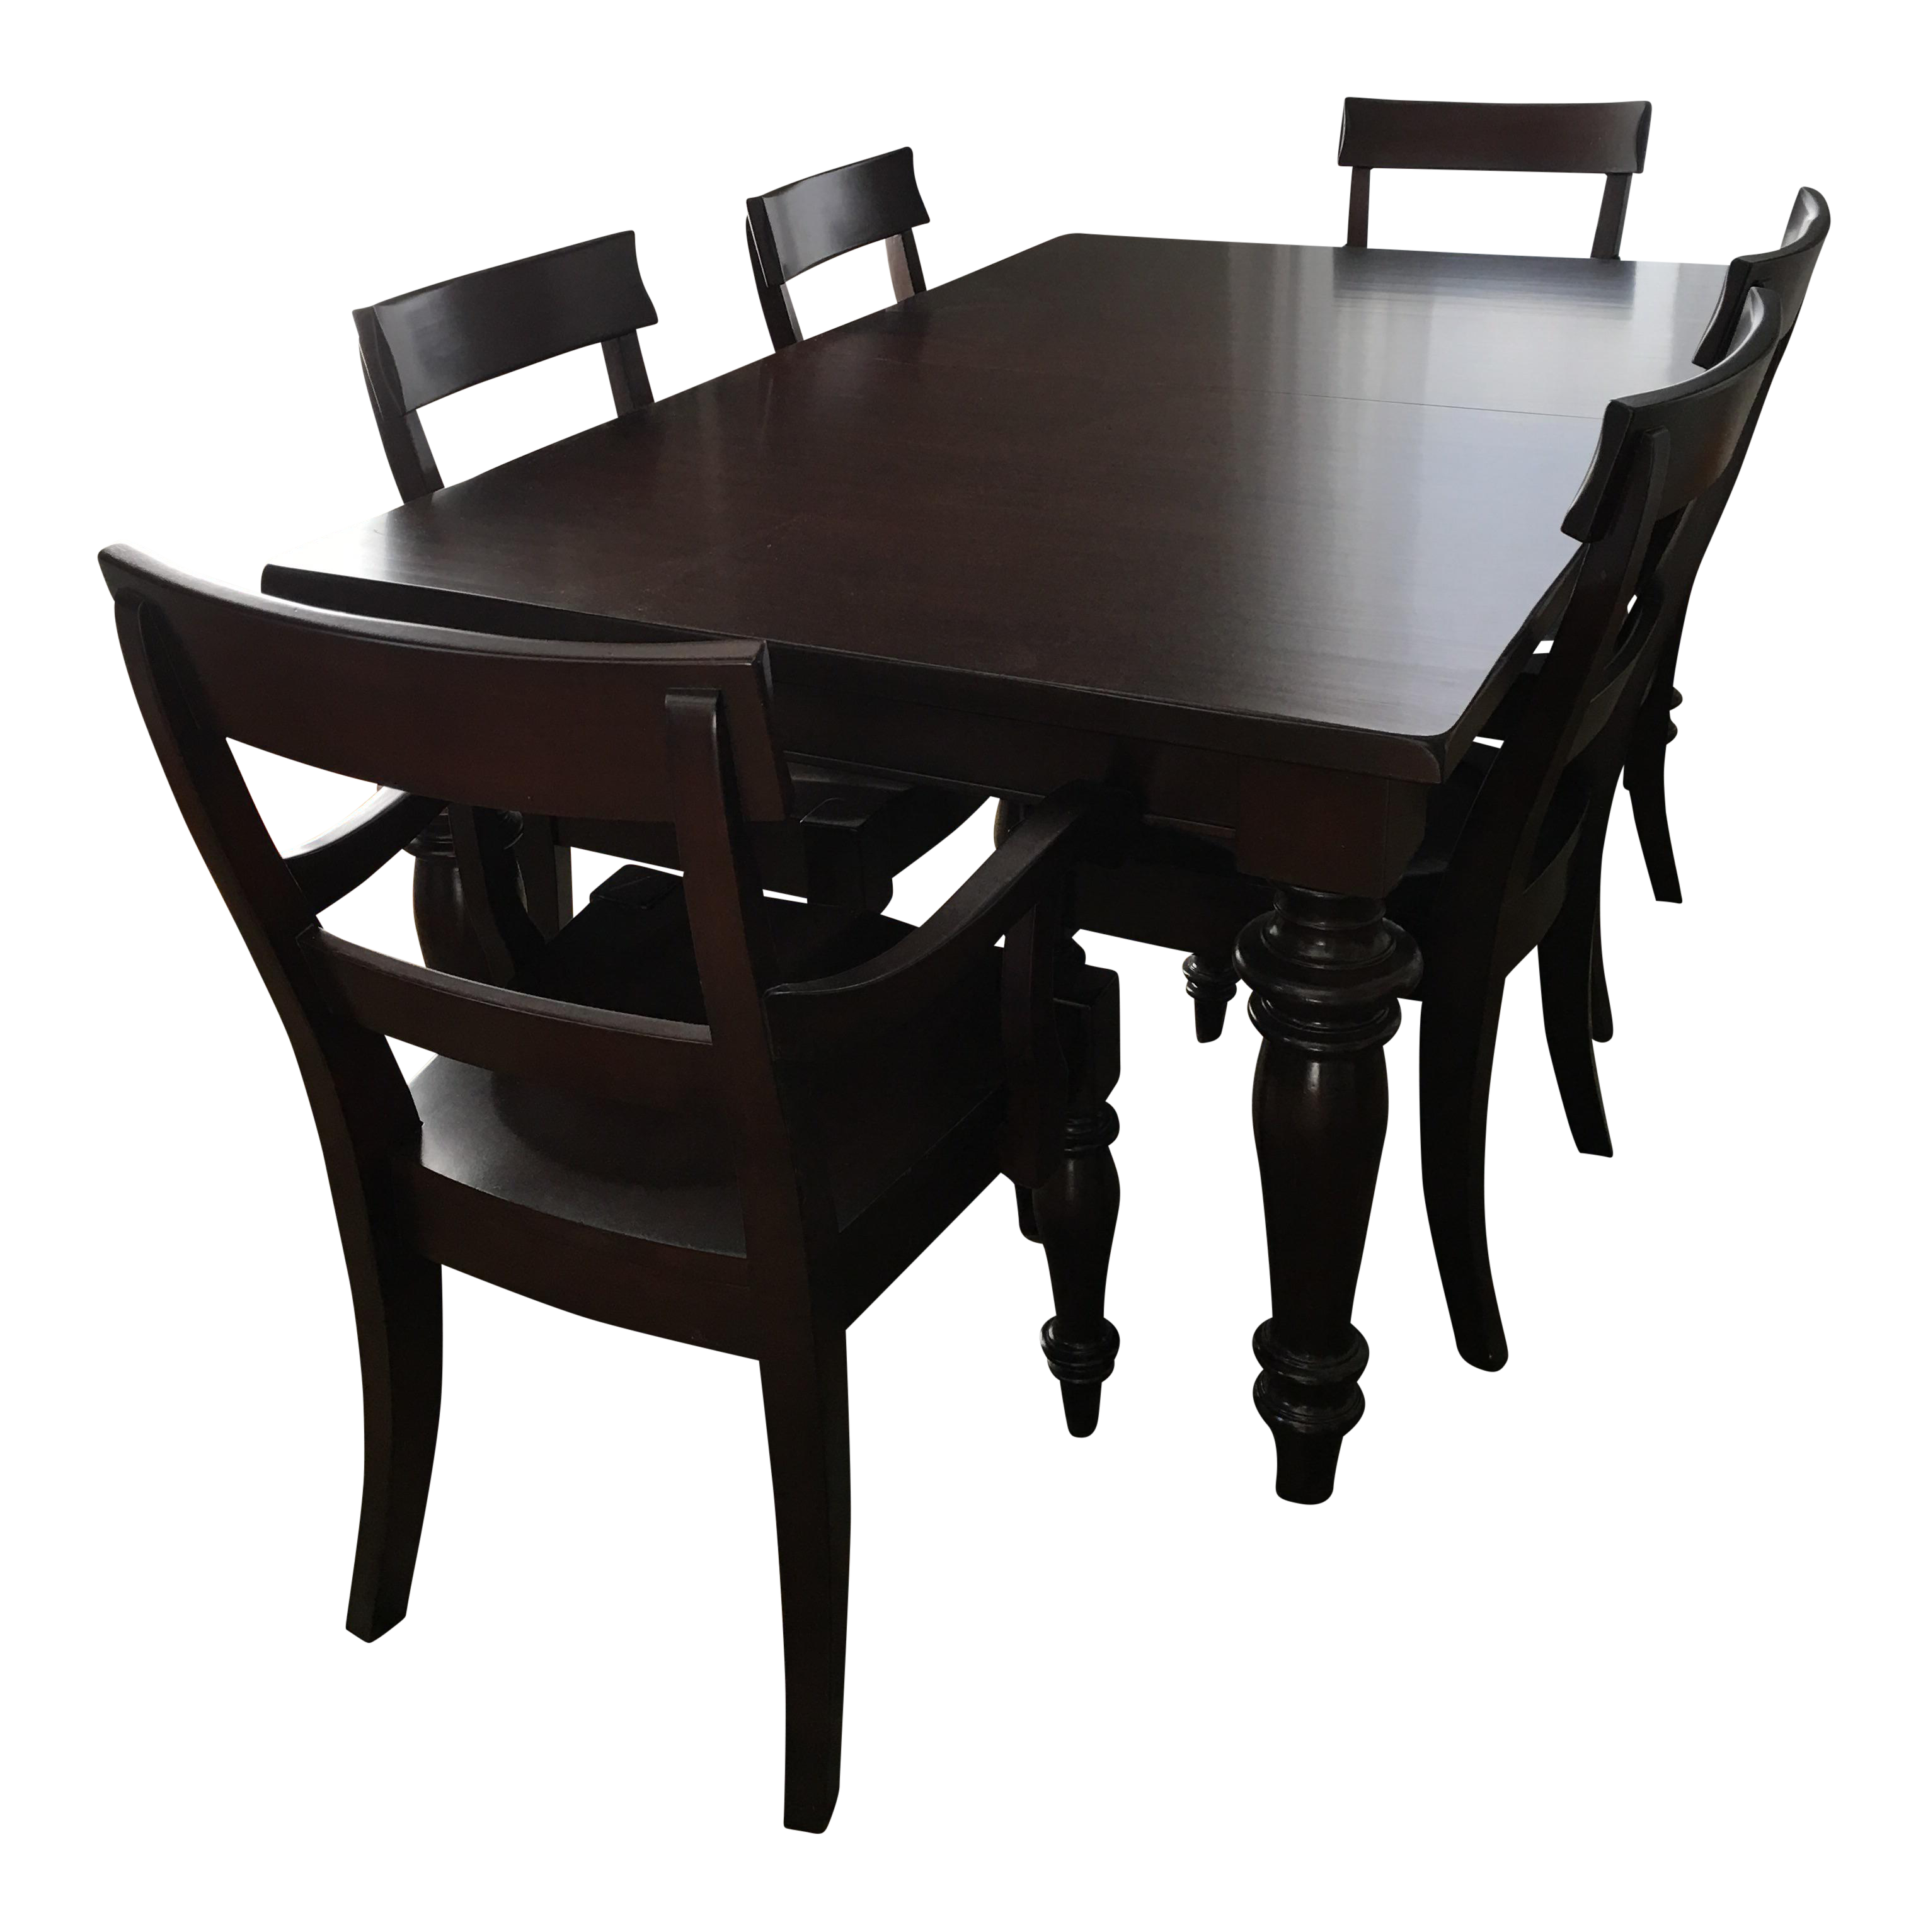 Pottery barn rectangular dining table - Pottery Barn Rectangular Dining Table 18